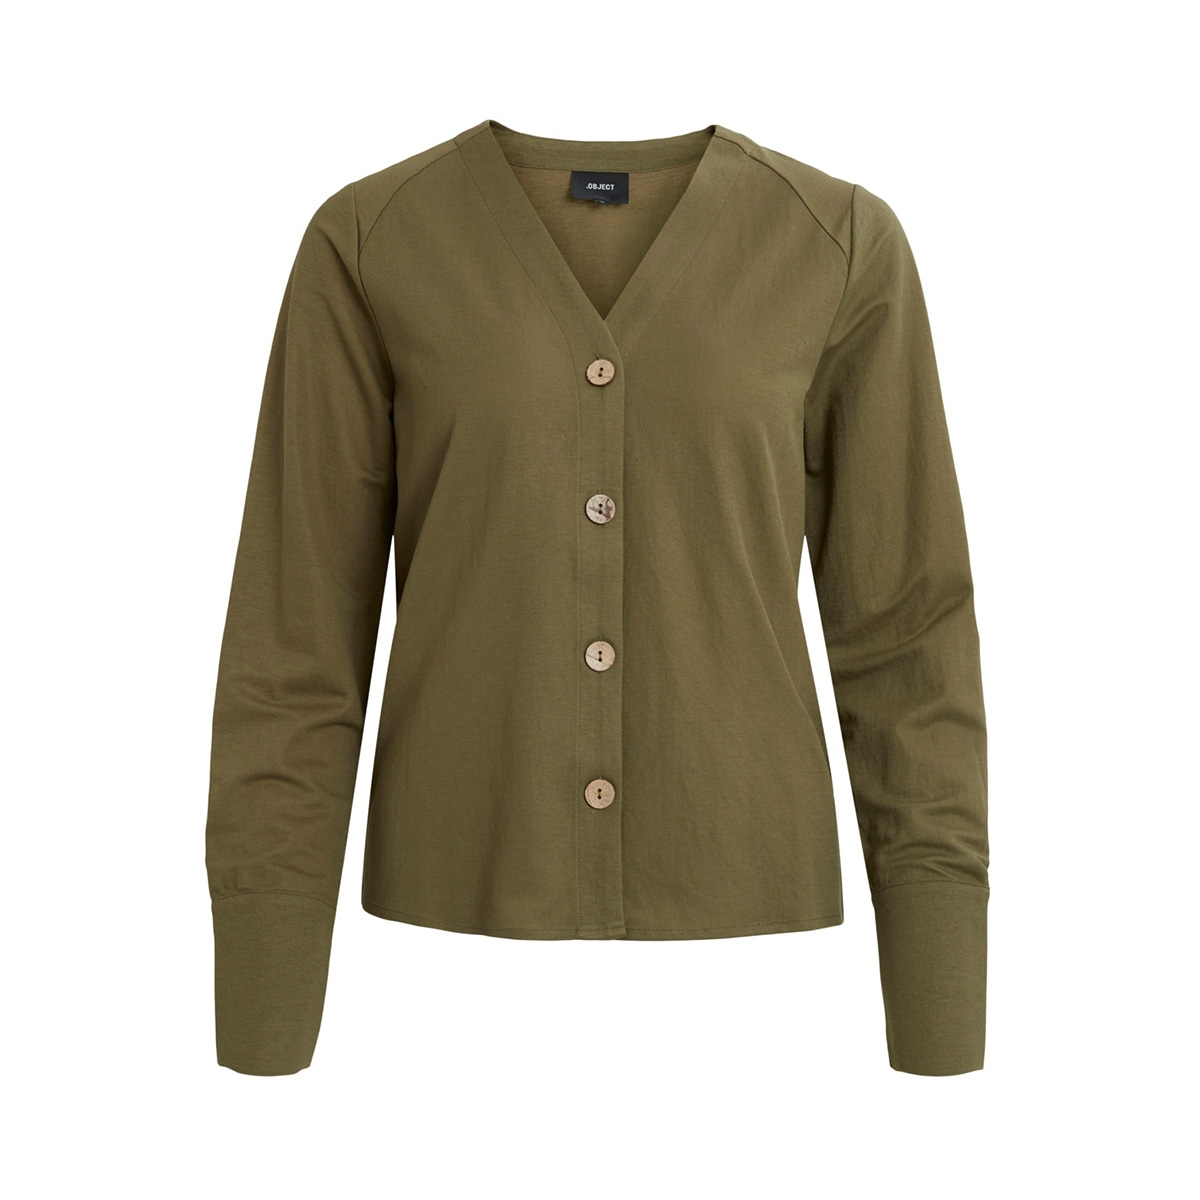 objthelma slim sleeve top 107 div 23032794 object blouse burnt olive